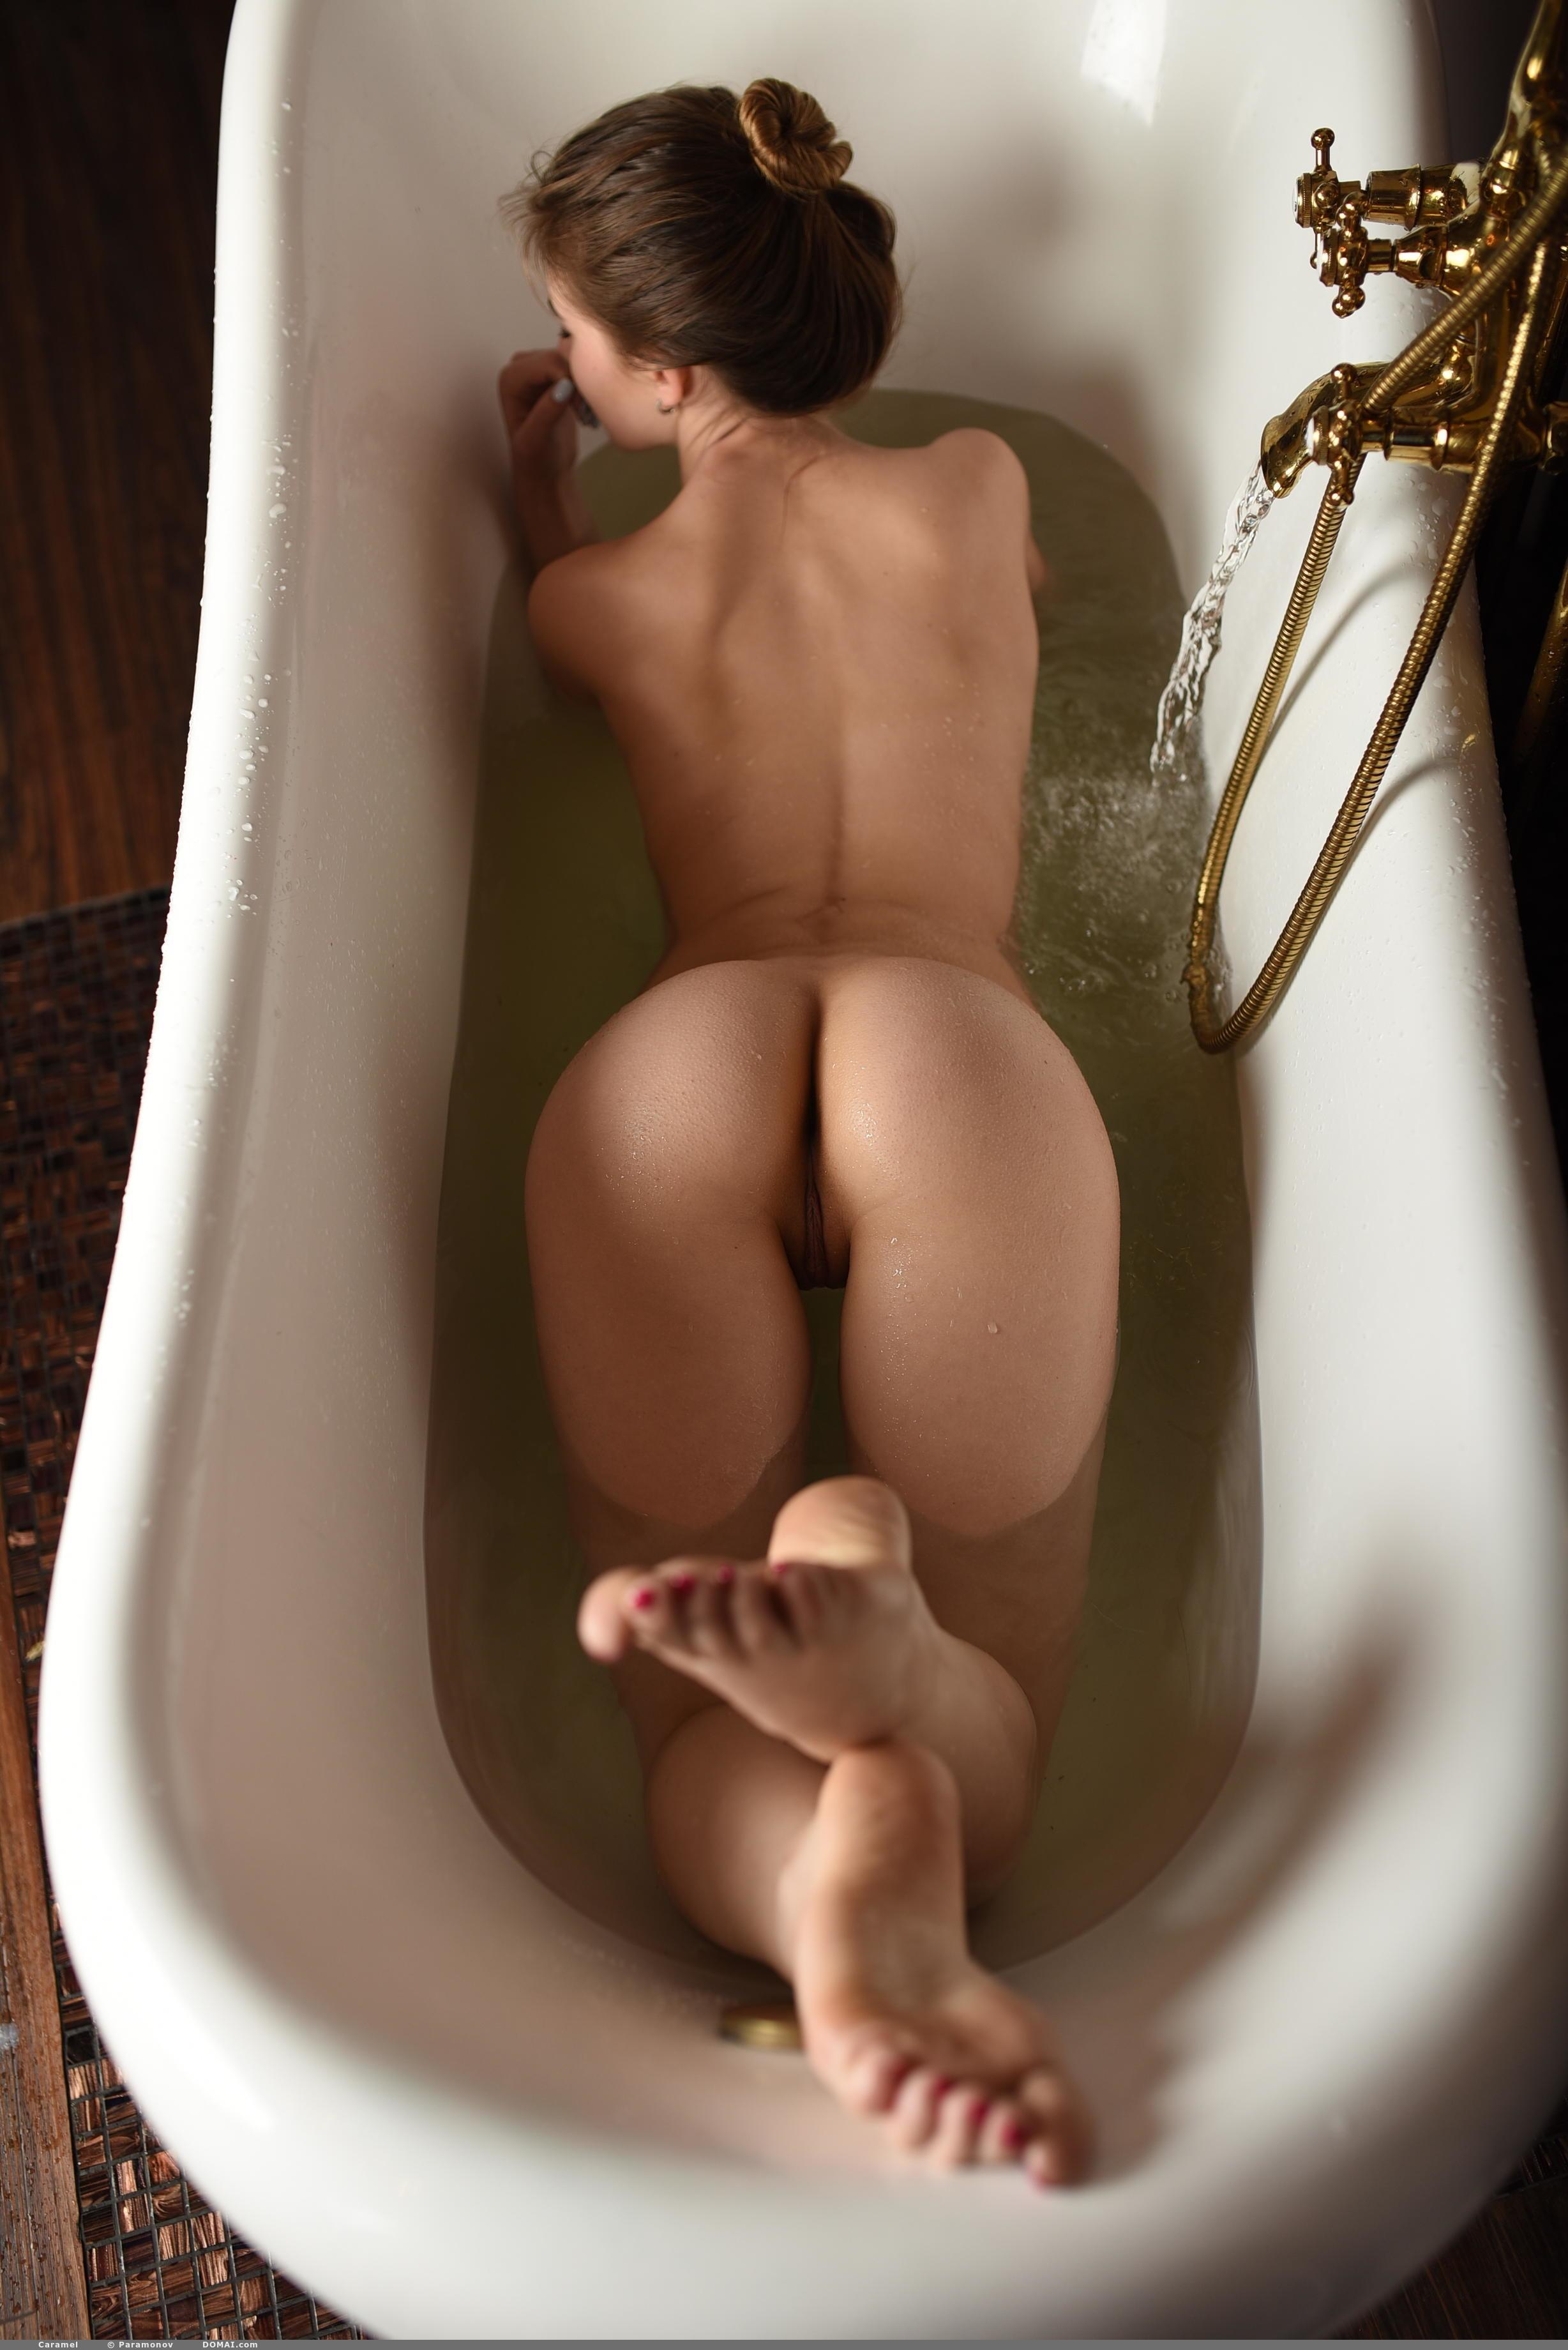 naked-girls-taking-bath-boobs-wet-mix-vol4-11